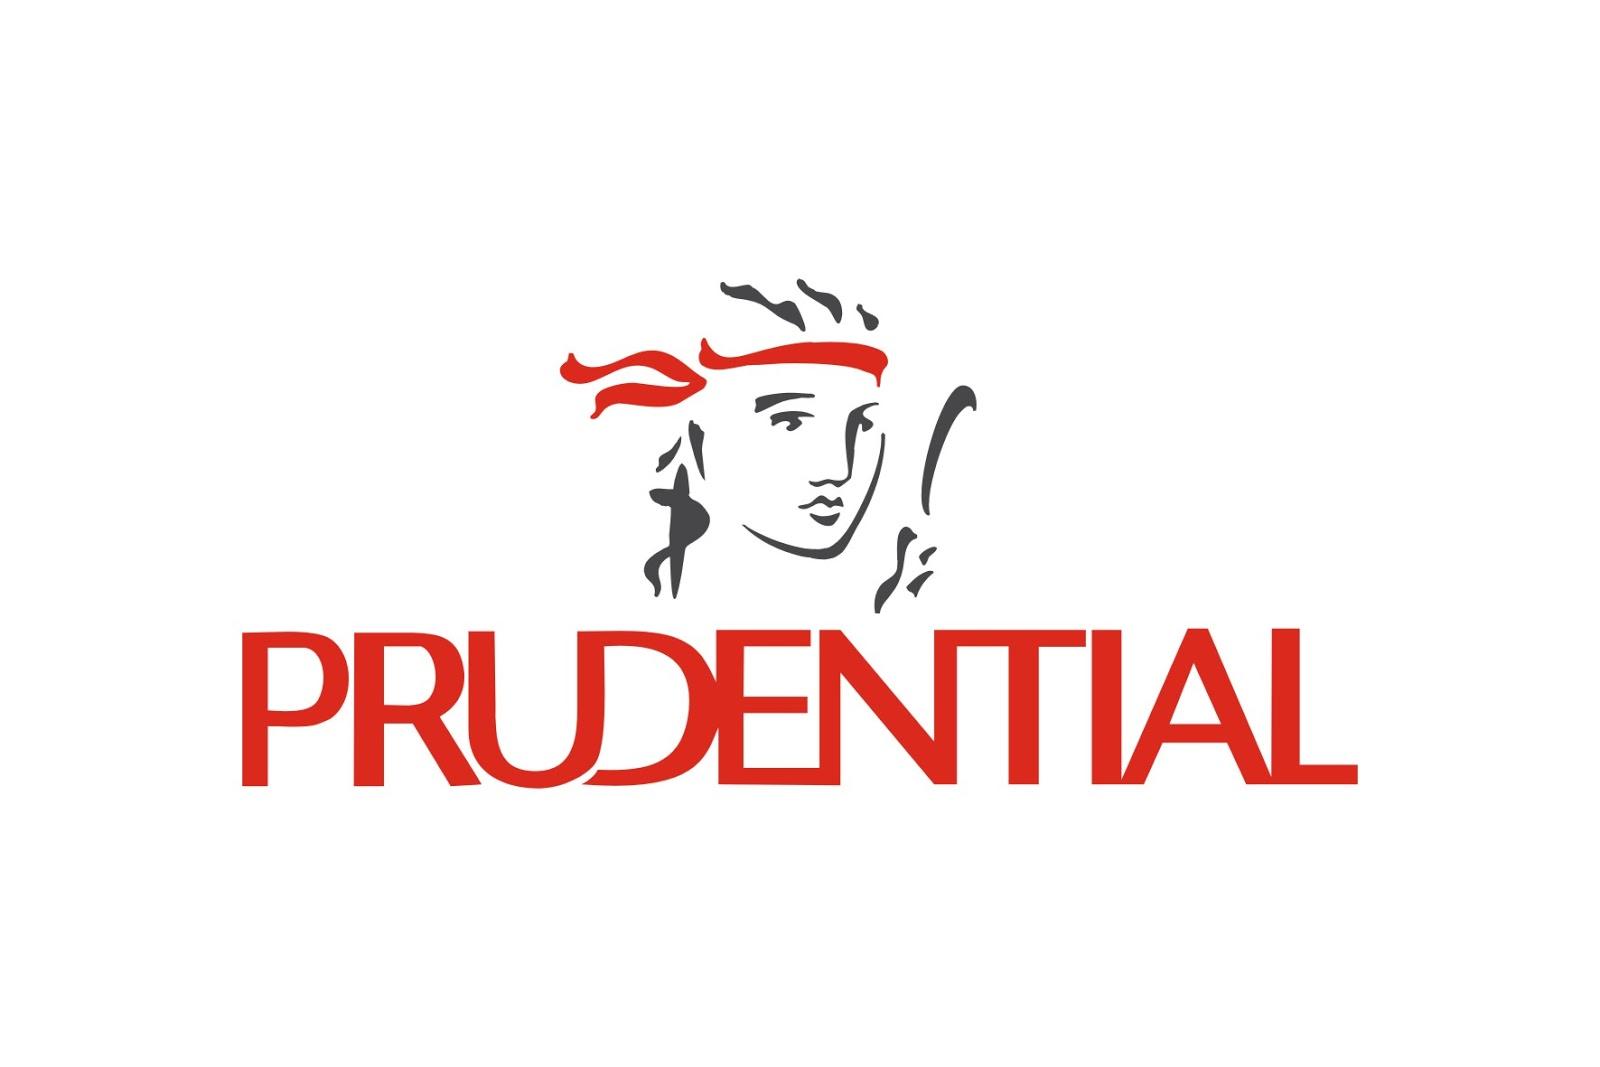 prudential logo #7